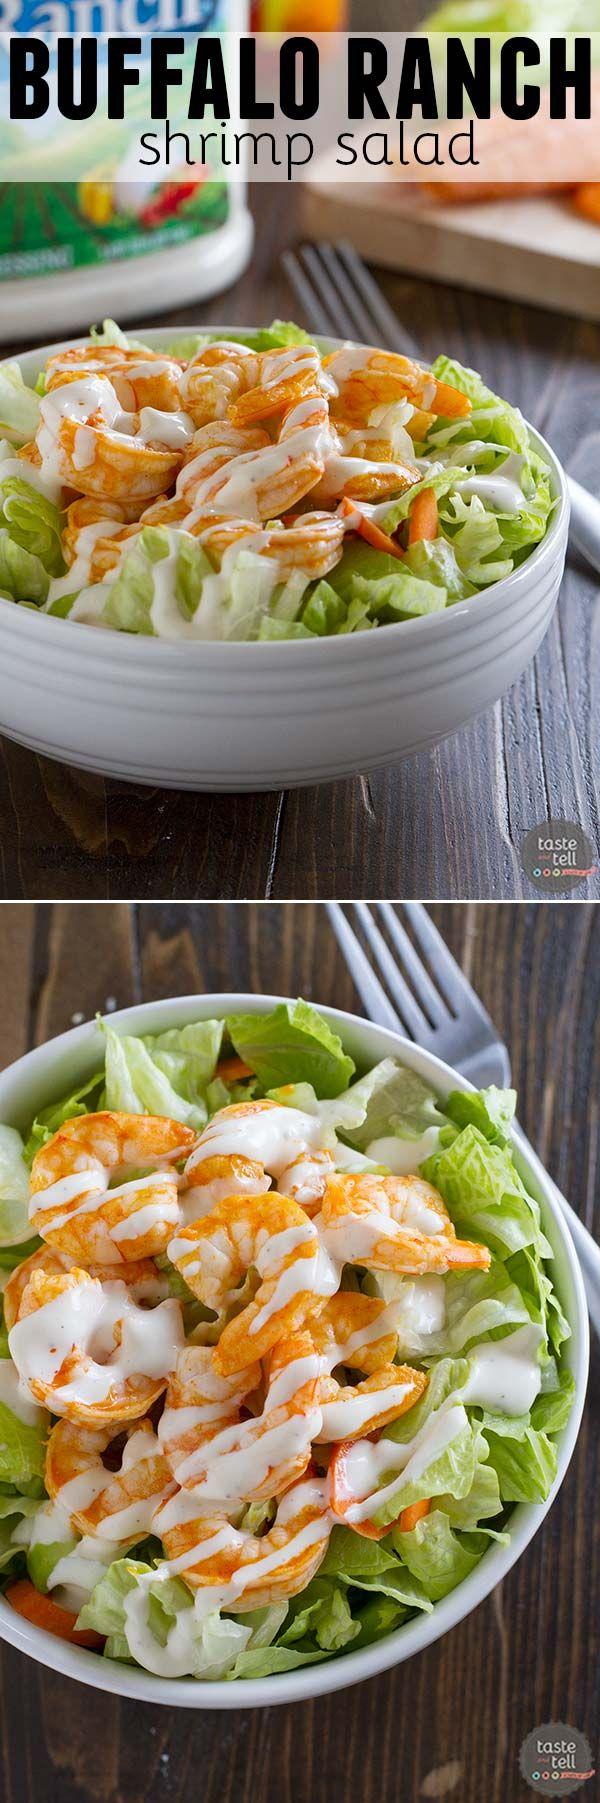 buffalo ranch shrimp salad - Ina Garten Shrimp Salad Recipe